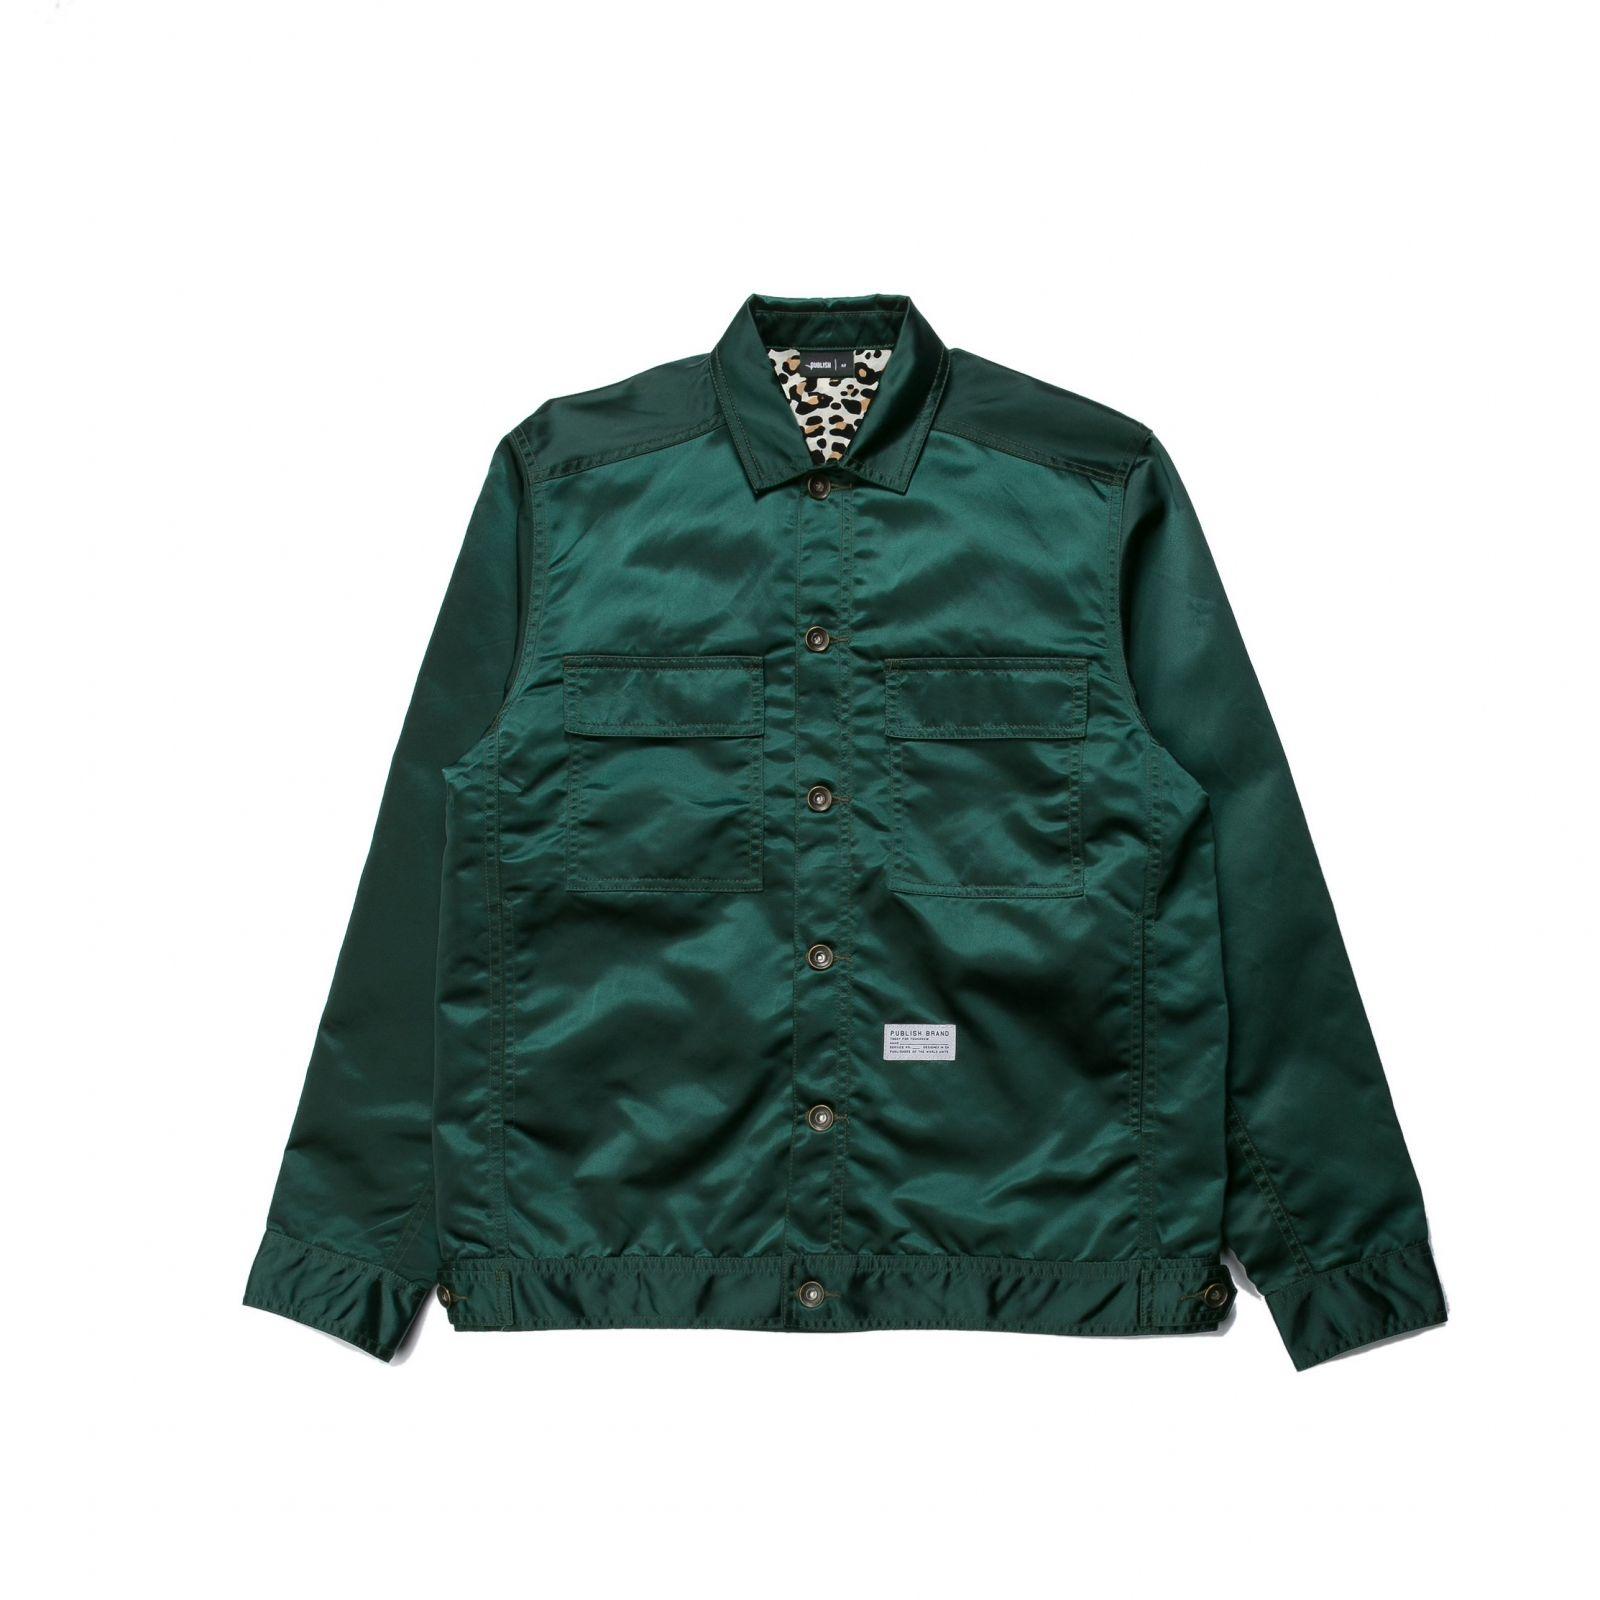 【PUBLISH BRAND/パブリッシュブランド】GLAZE ナイロンワークジャケット / GREEN